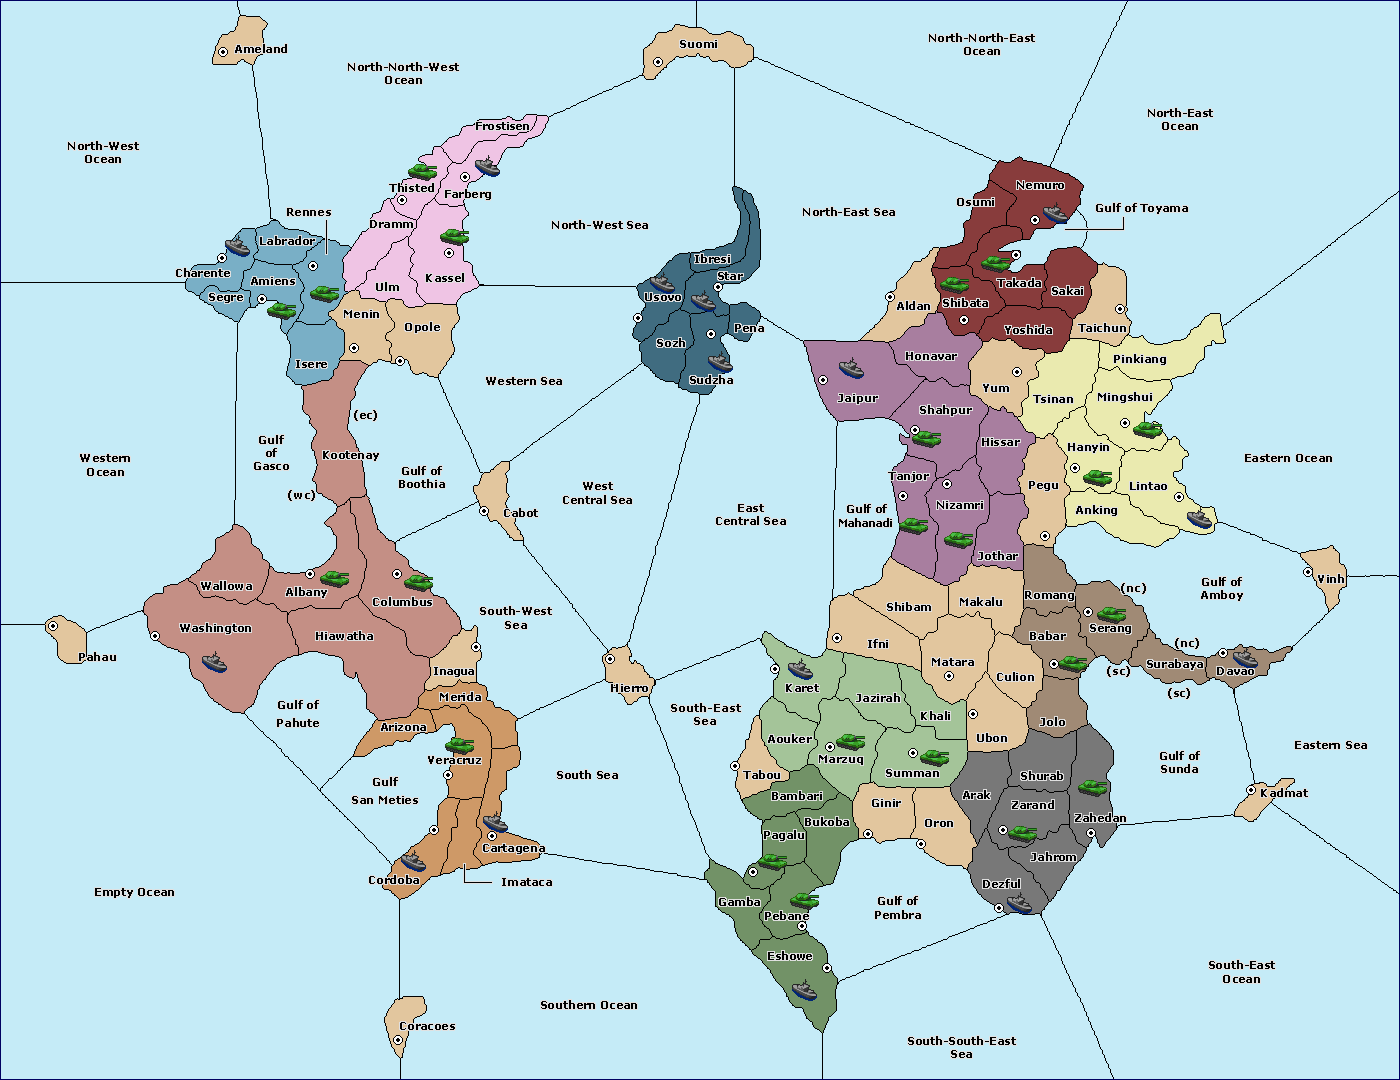 Variants - vDiplomacy